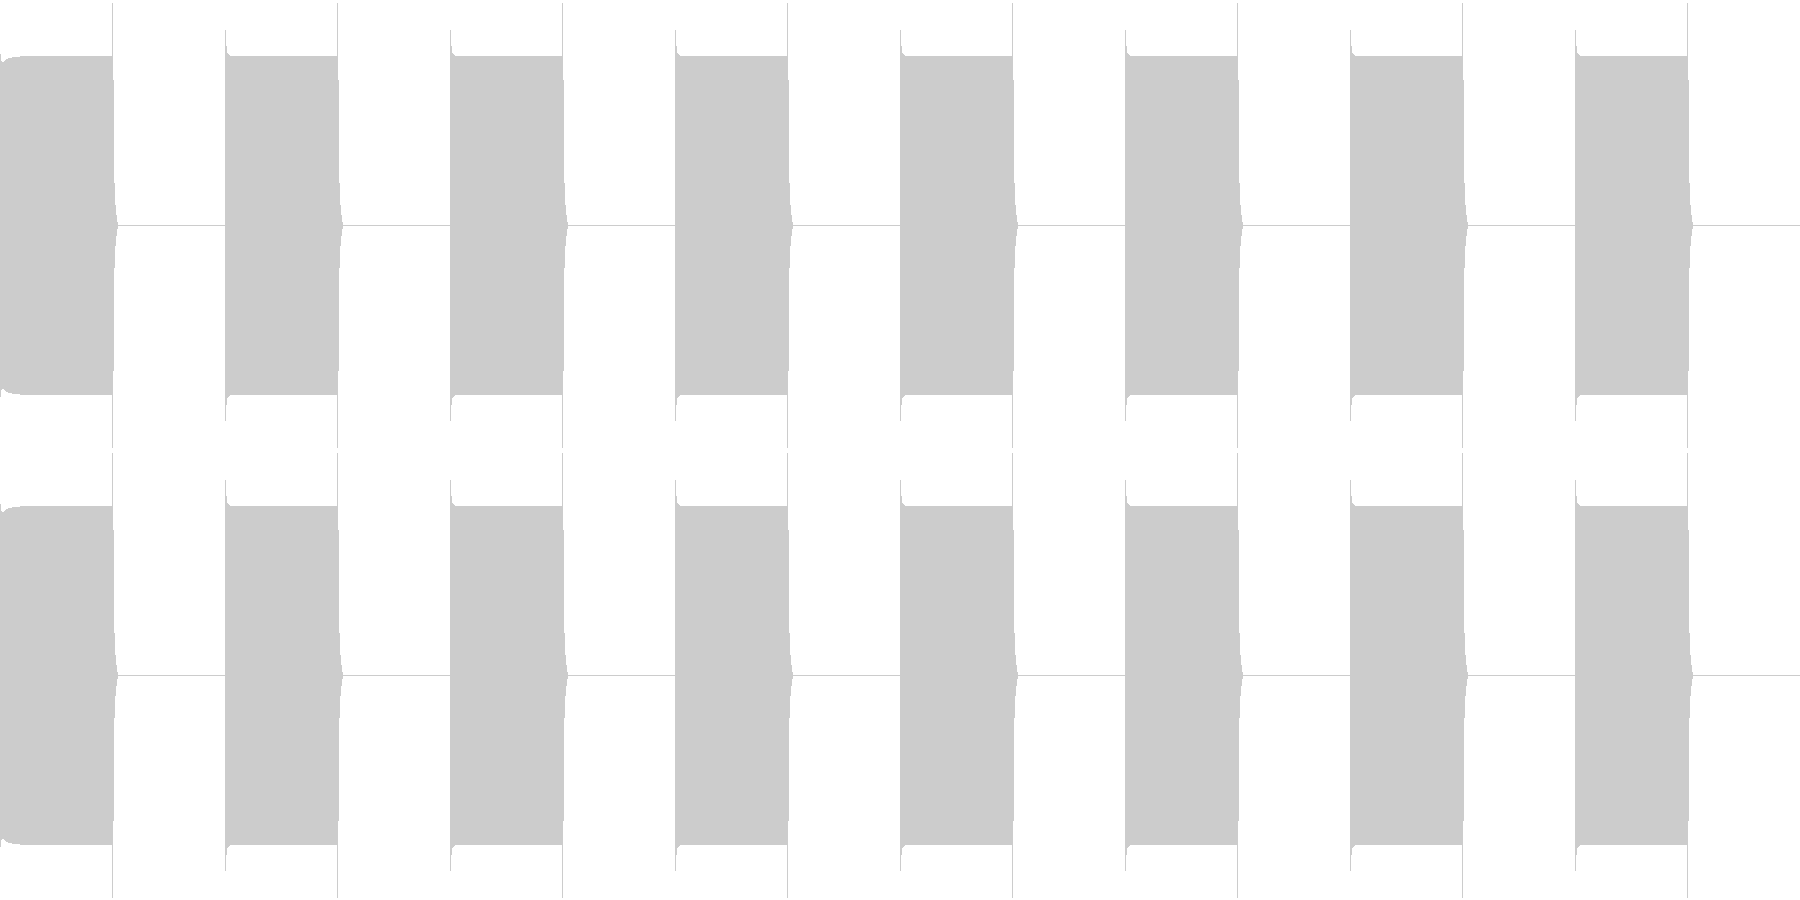 TEL 話し中のベル音 2 繋がらないの未再生の波形